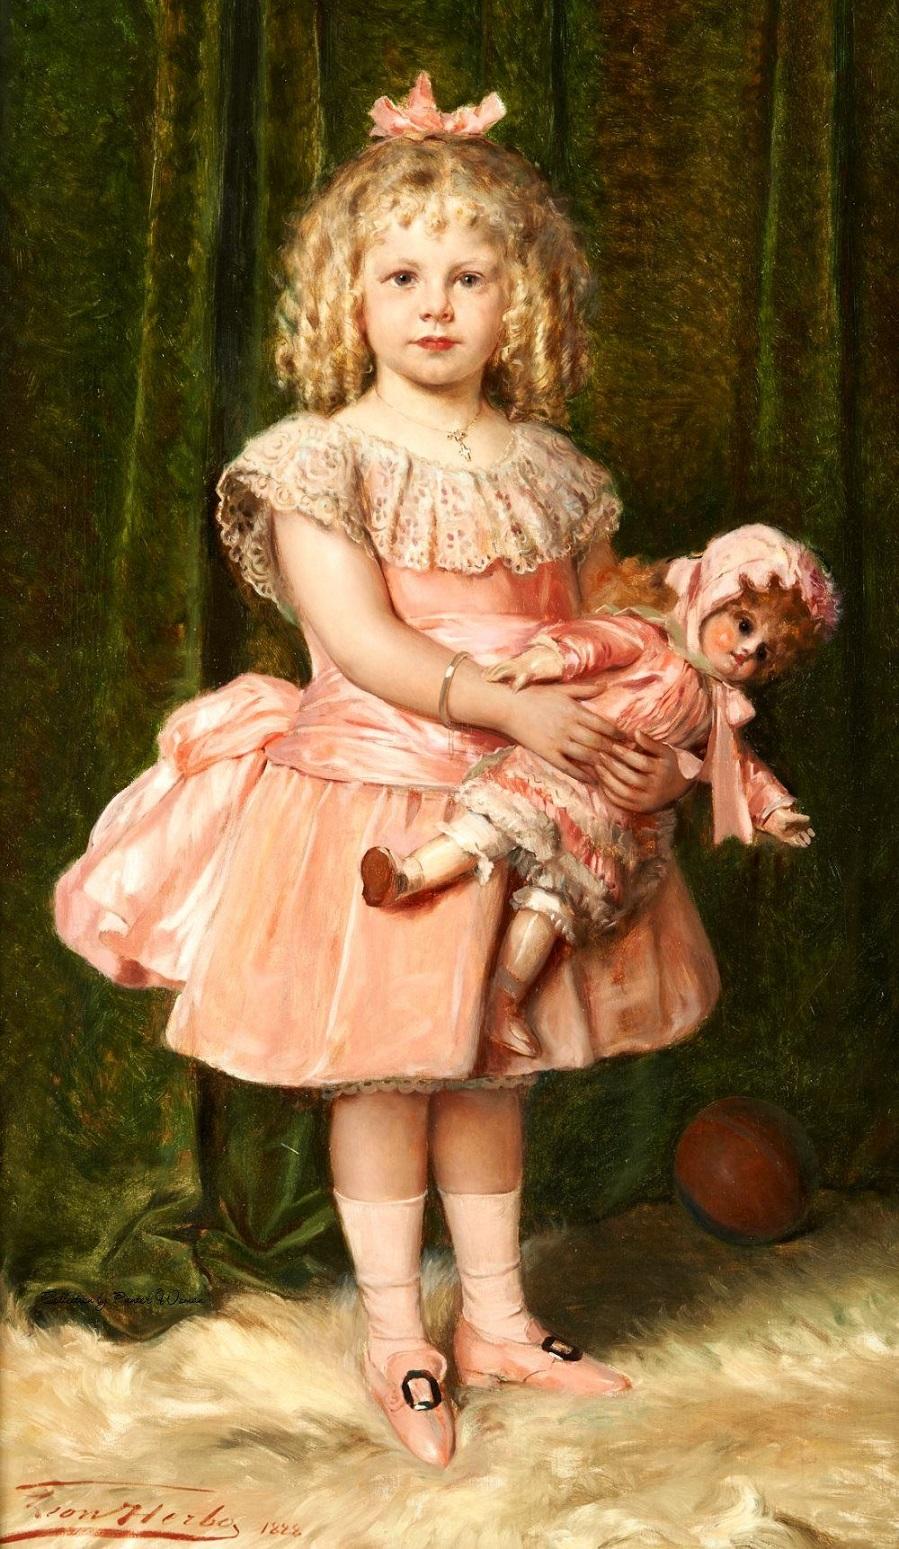 Leon-Herbo-1850-1907.jpg